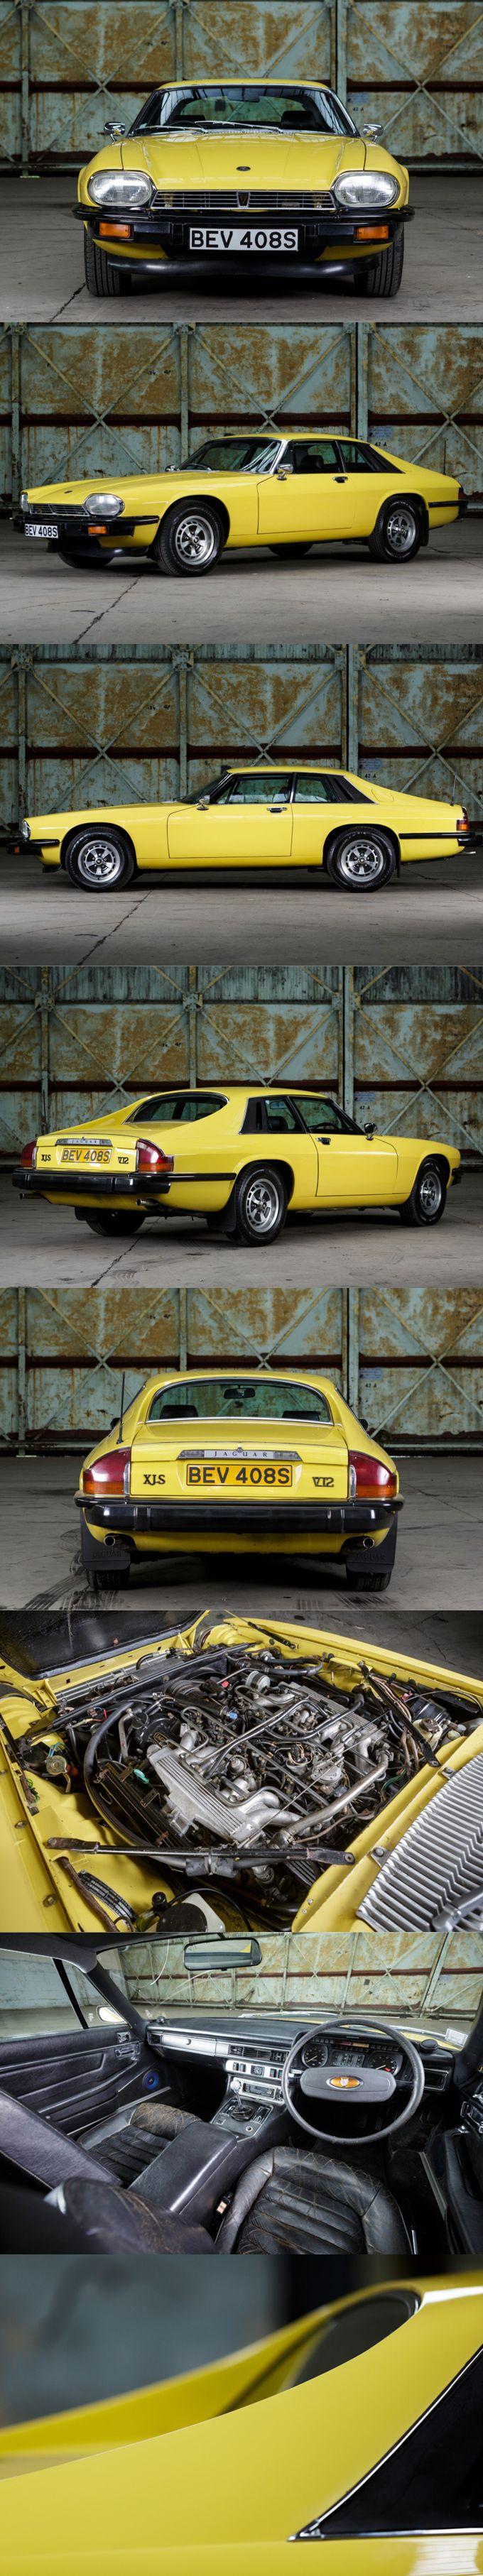 Jaguar driving gloves uk - 1977 Jaguar Xjs V12 Cotwold Yellow Pendine Co Uk